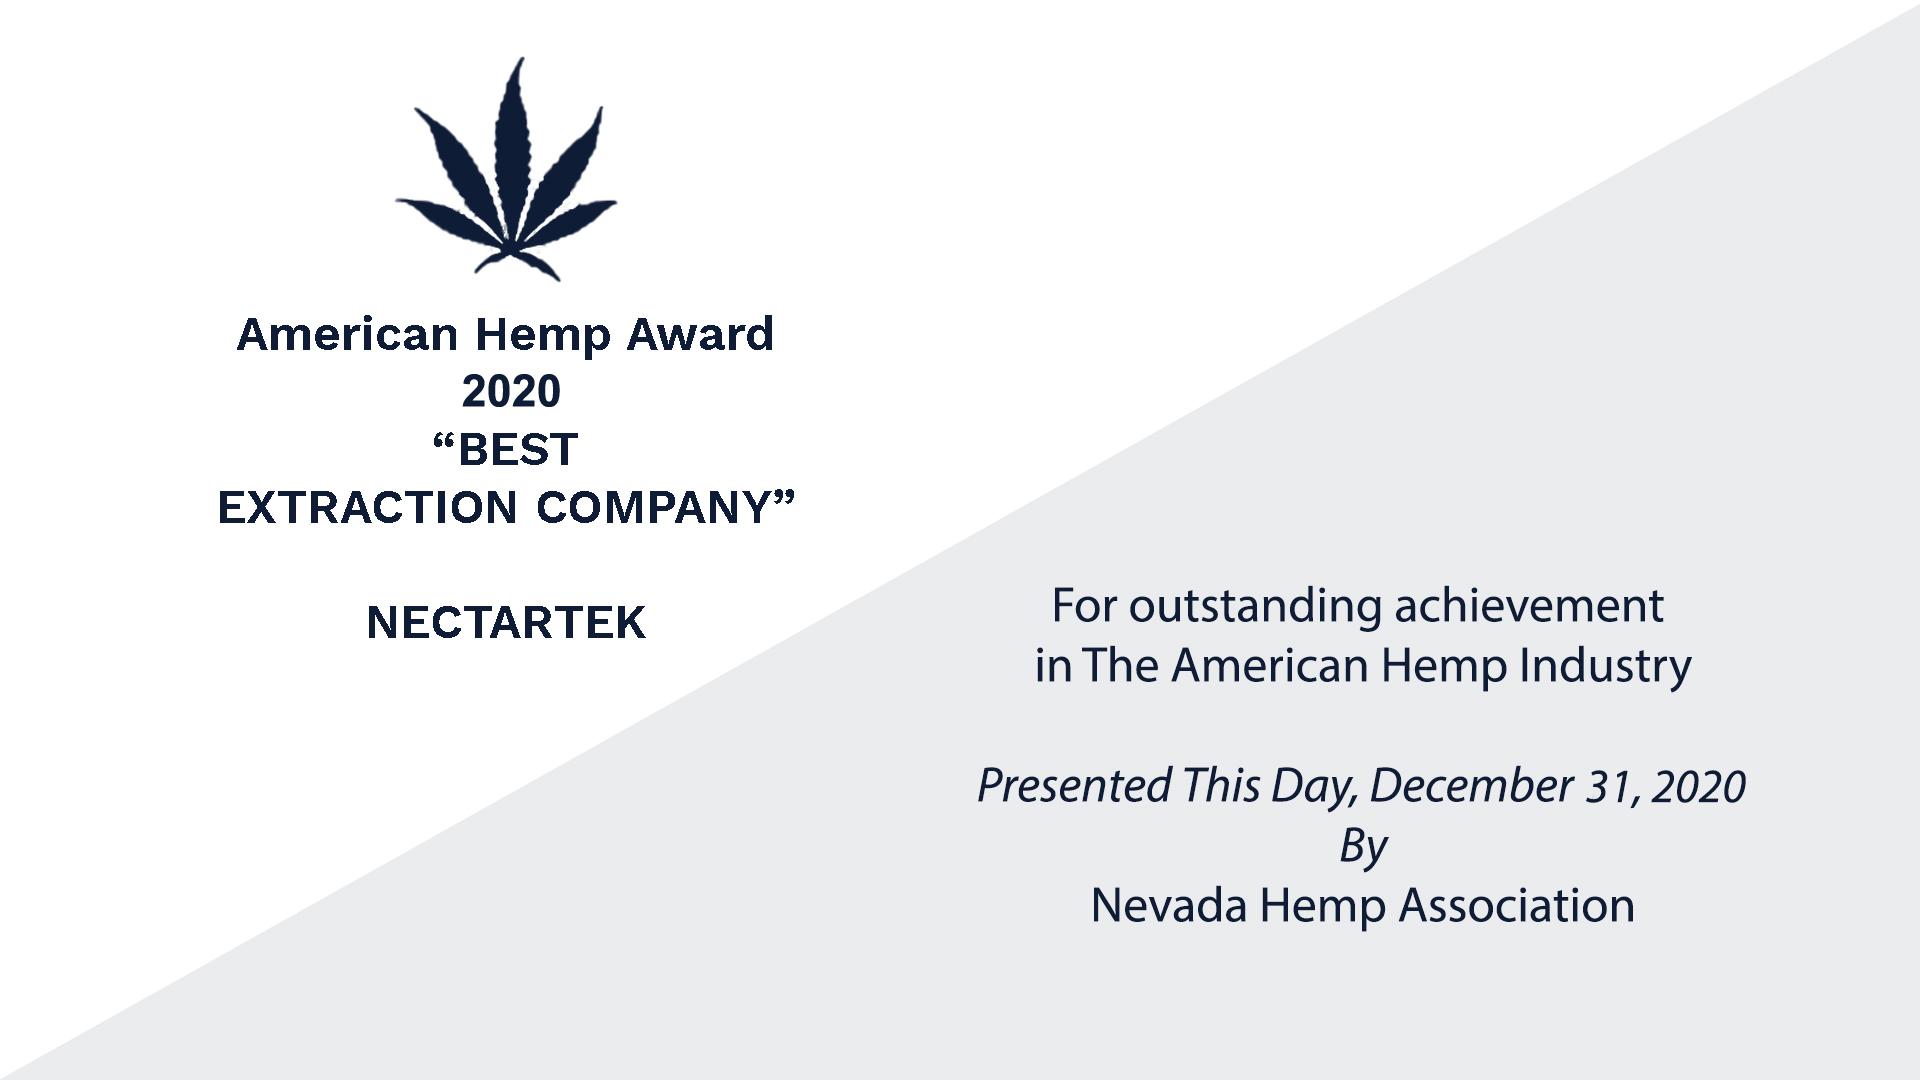 American Hemp Awards 2020